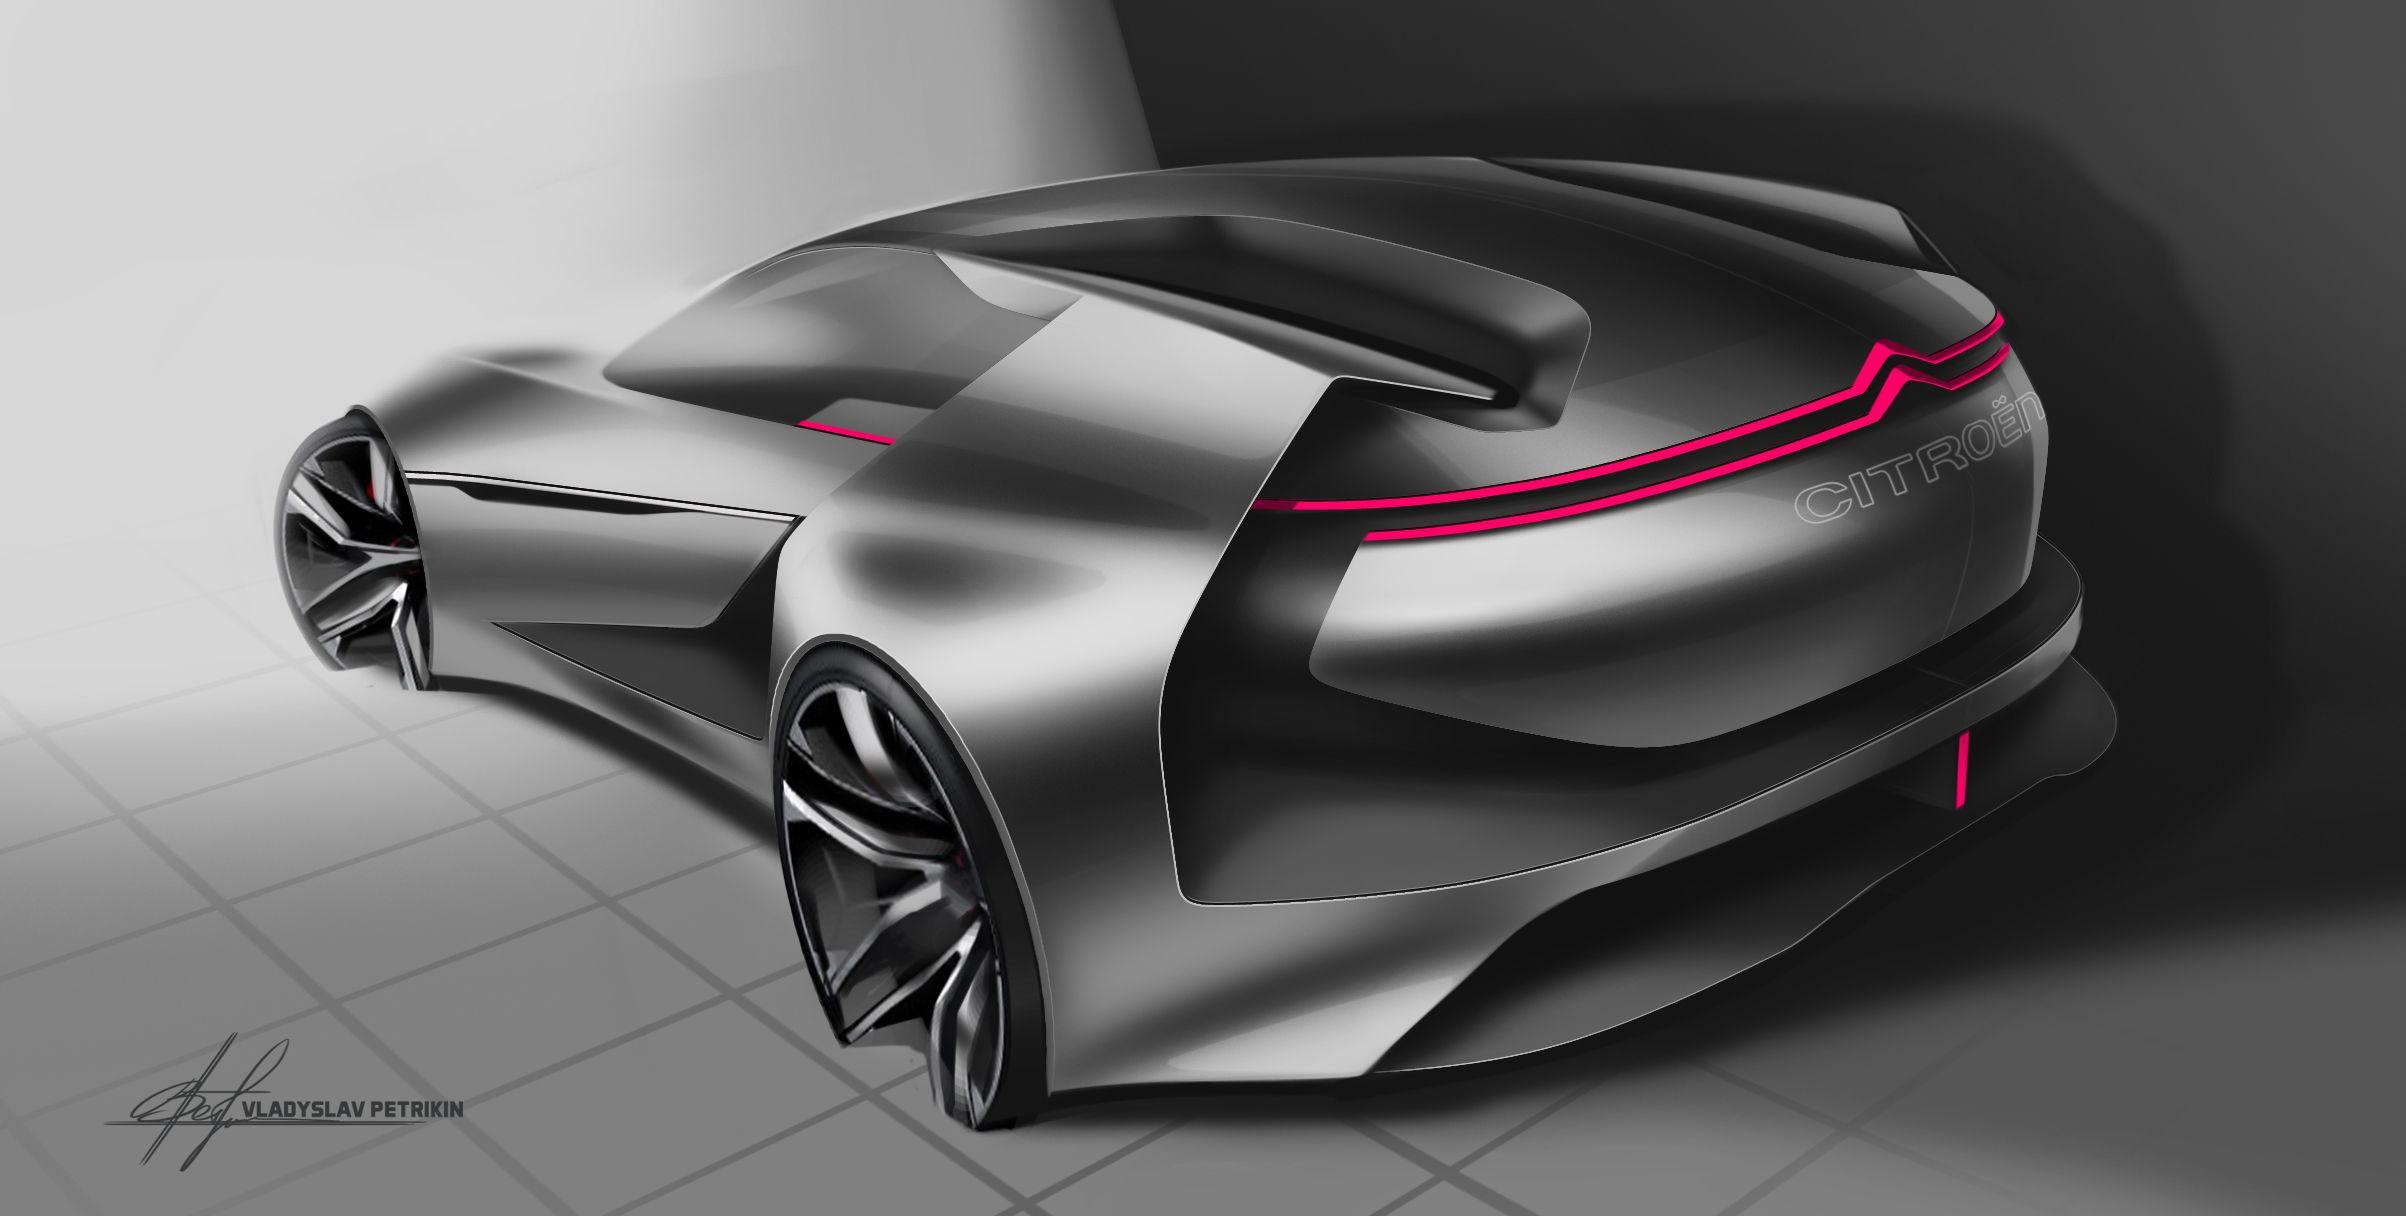 Citroёn for #ShootingBrakeChallenge #cardesign, #design, #automotivedesign, #transportdesign, #vehicledesign, #industrialdesign, #productdesign, #doodle, #cardrawing, #sketch, #carsketch, #concept, #art, #wheels, #photoshop, #sport, #pencil, #marker, #drawing, #electric, #engine, #dailysketch, #supercar, #sportscar, #black, #white, #shootingbrake, #citroen, #france